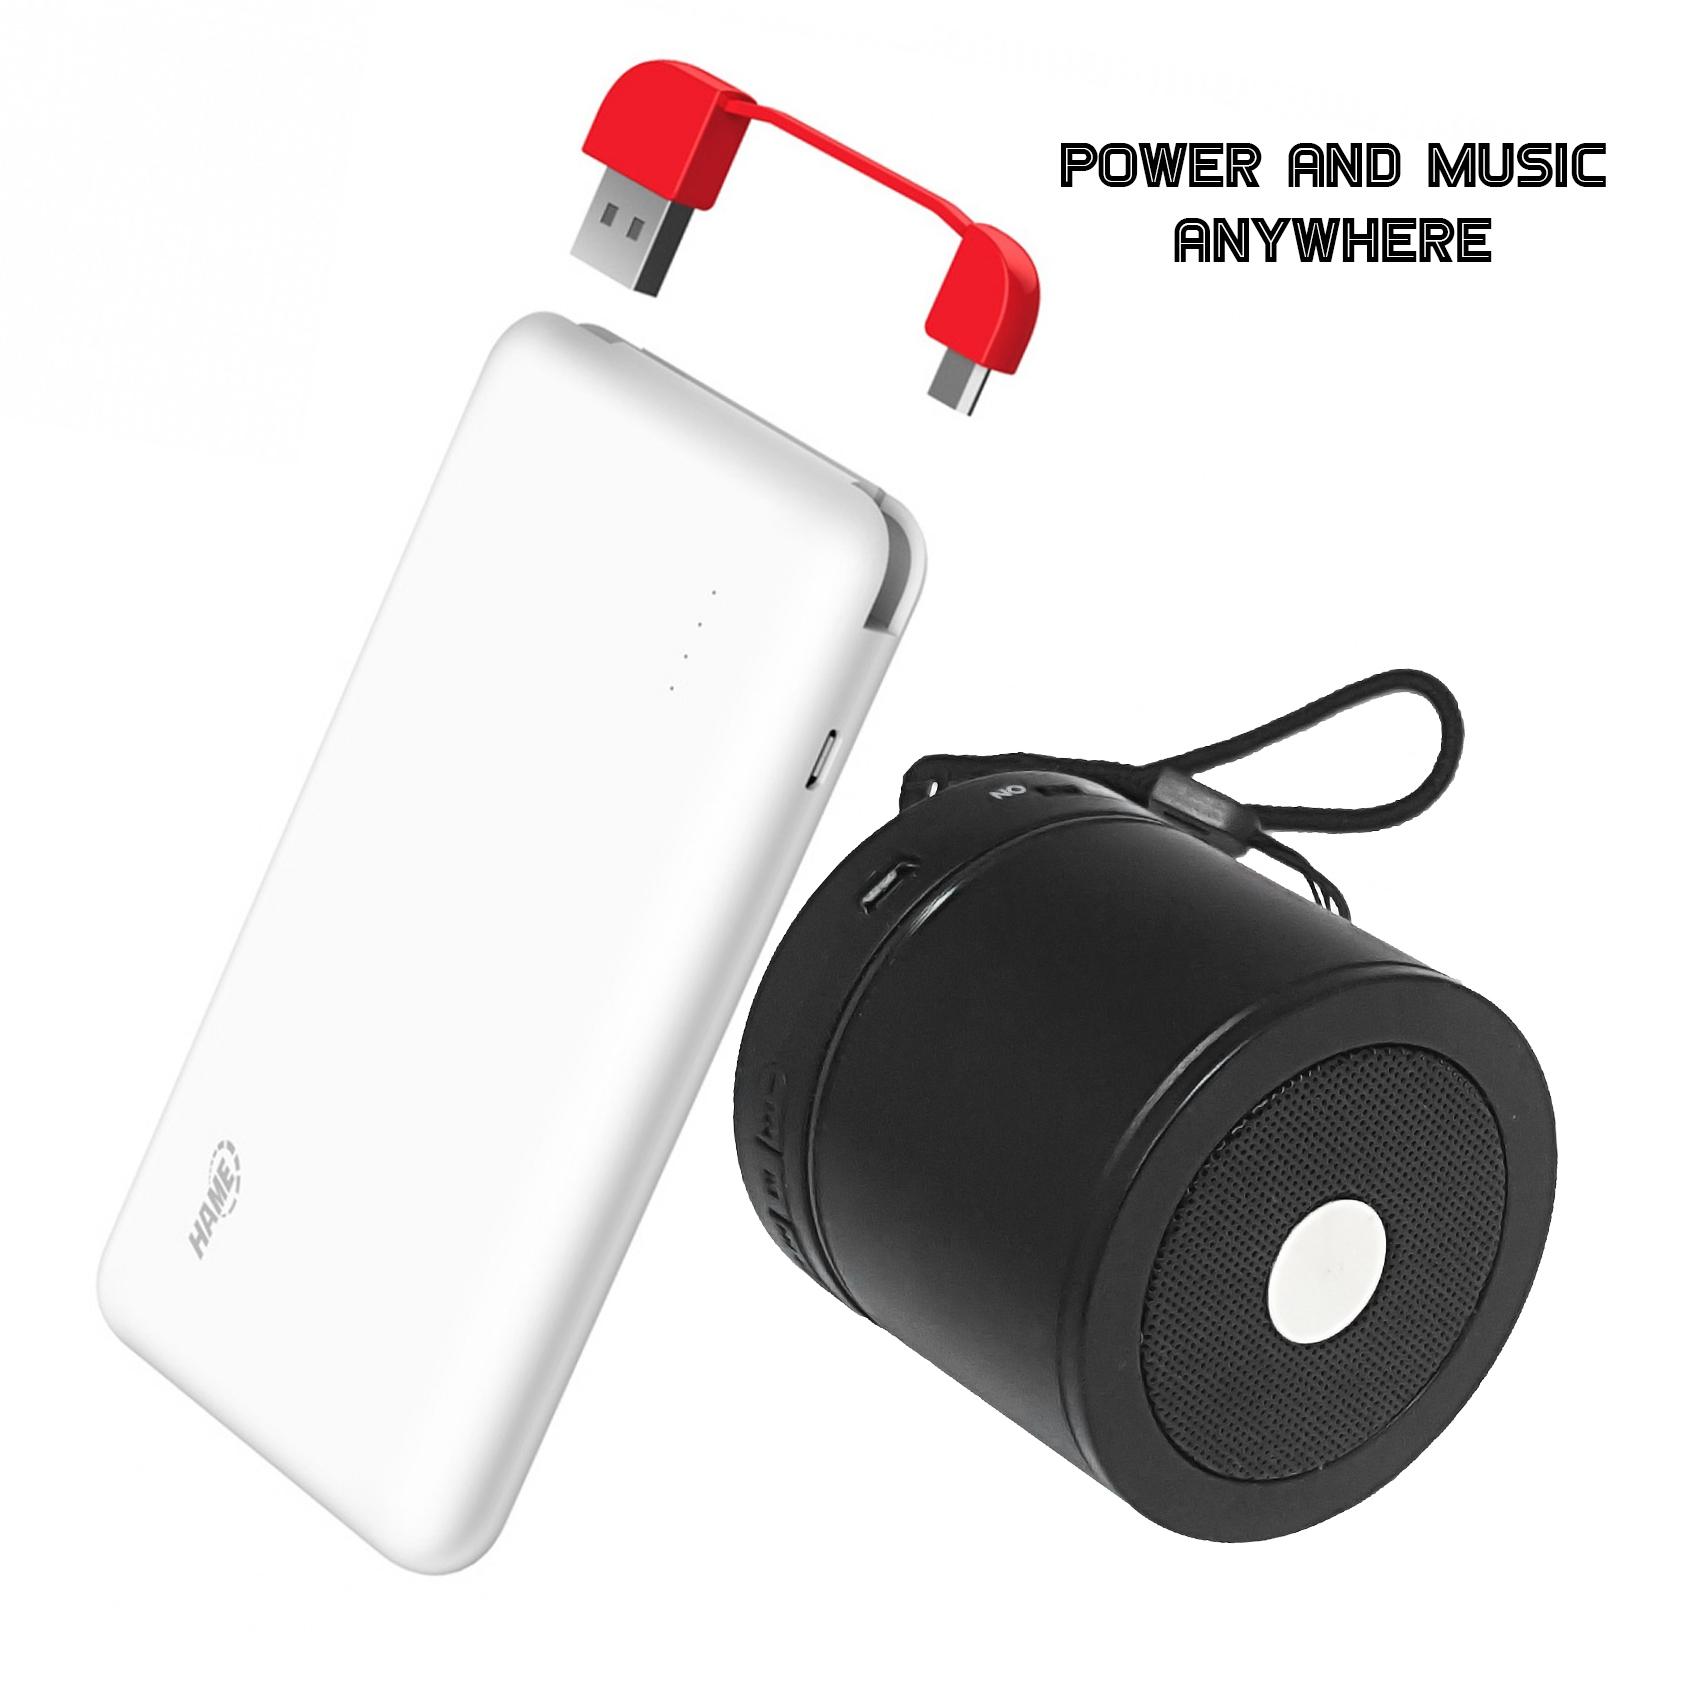 Hame T6 10000 mAh Powerbank And AEC BQ-606 Mini Bluetooth Speaker - Black/White